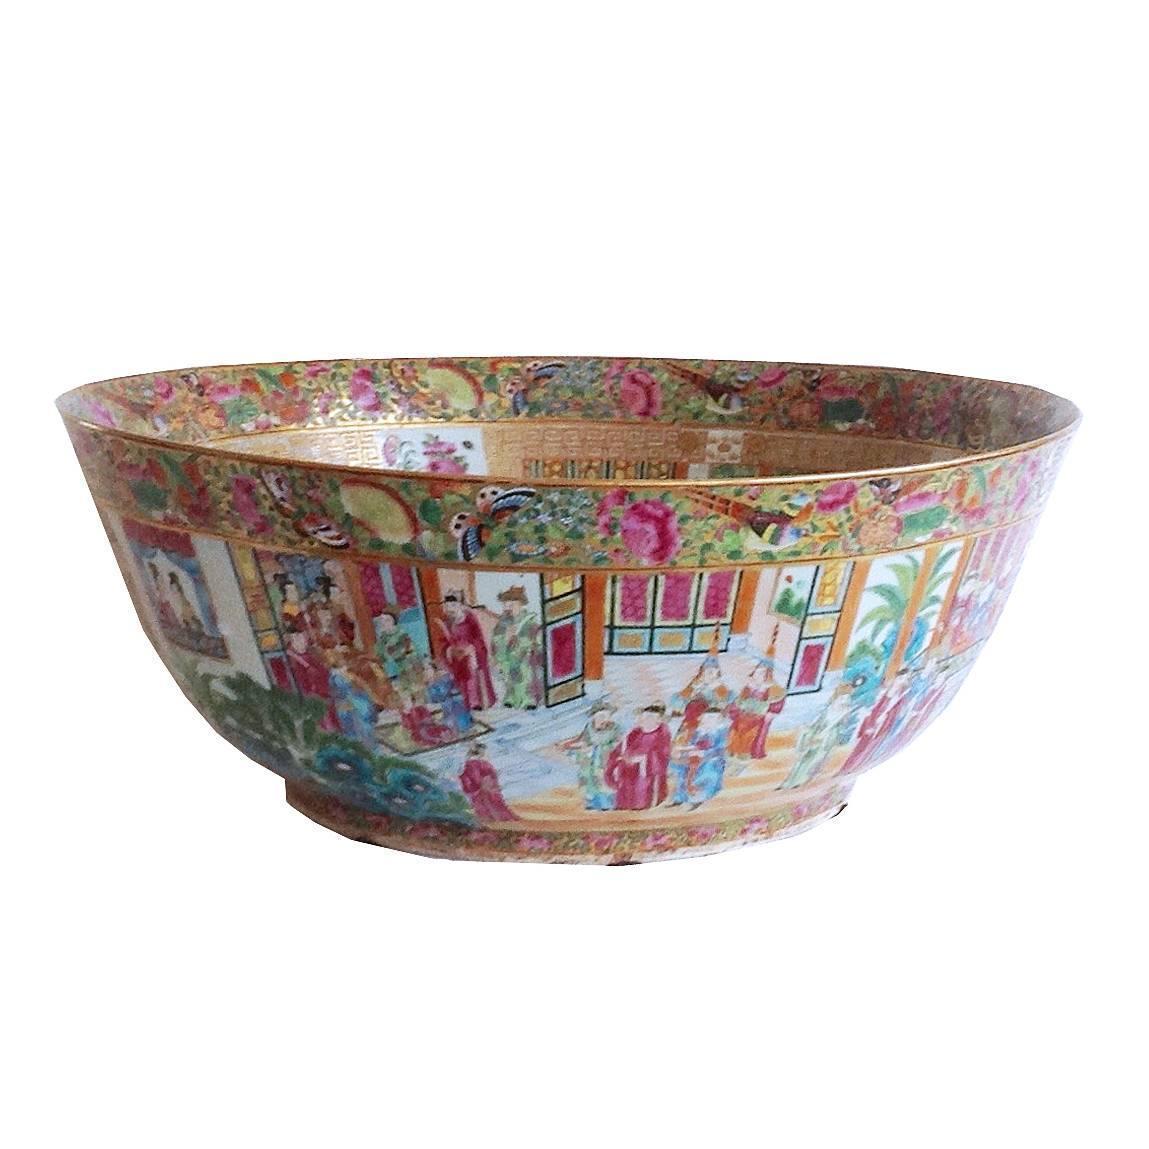 Gold Decorative Bowl Antique And Vintage Serving Bowls 907 For Sale At 1stdibs